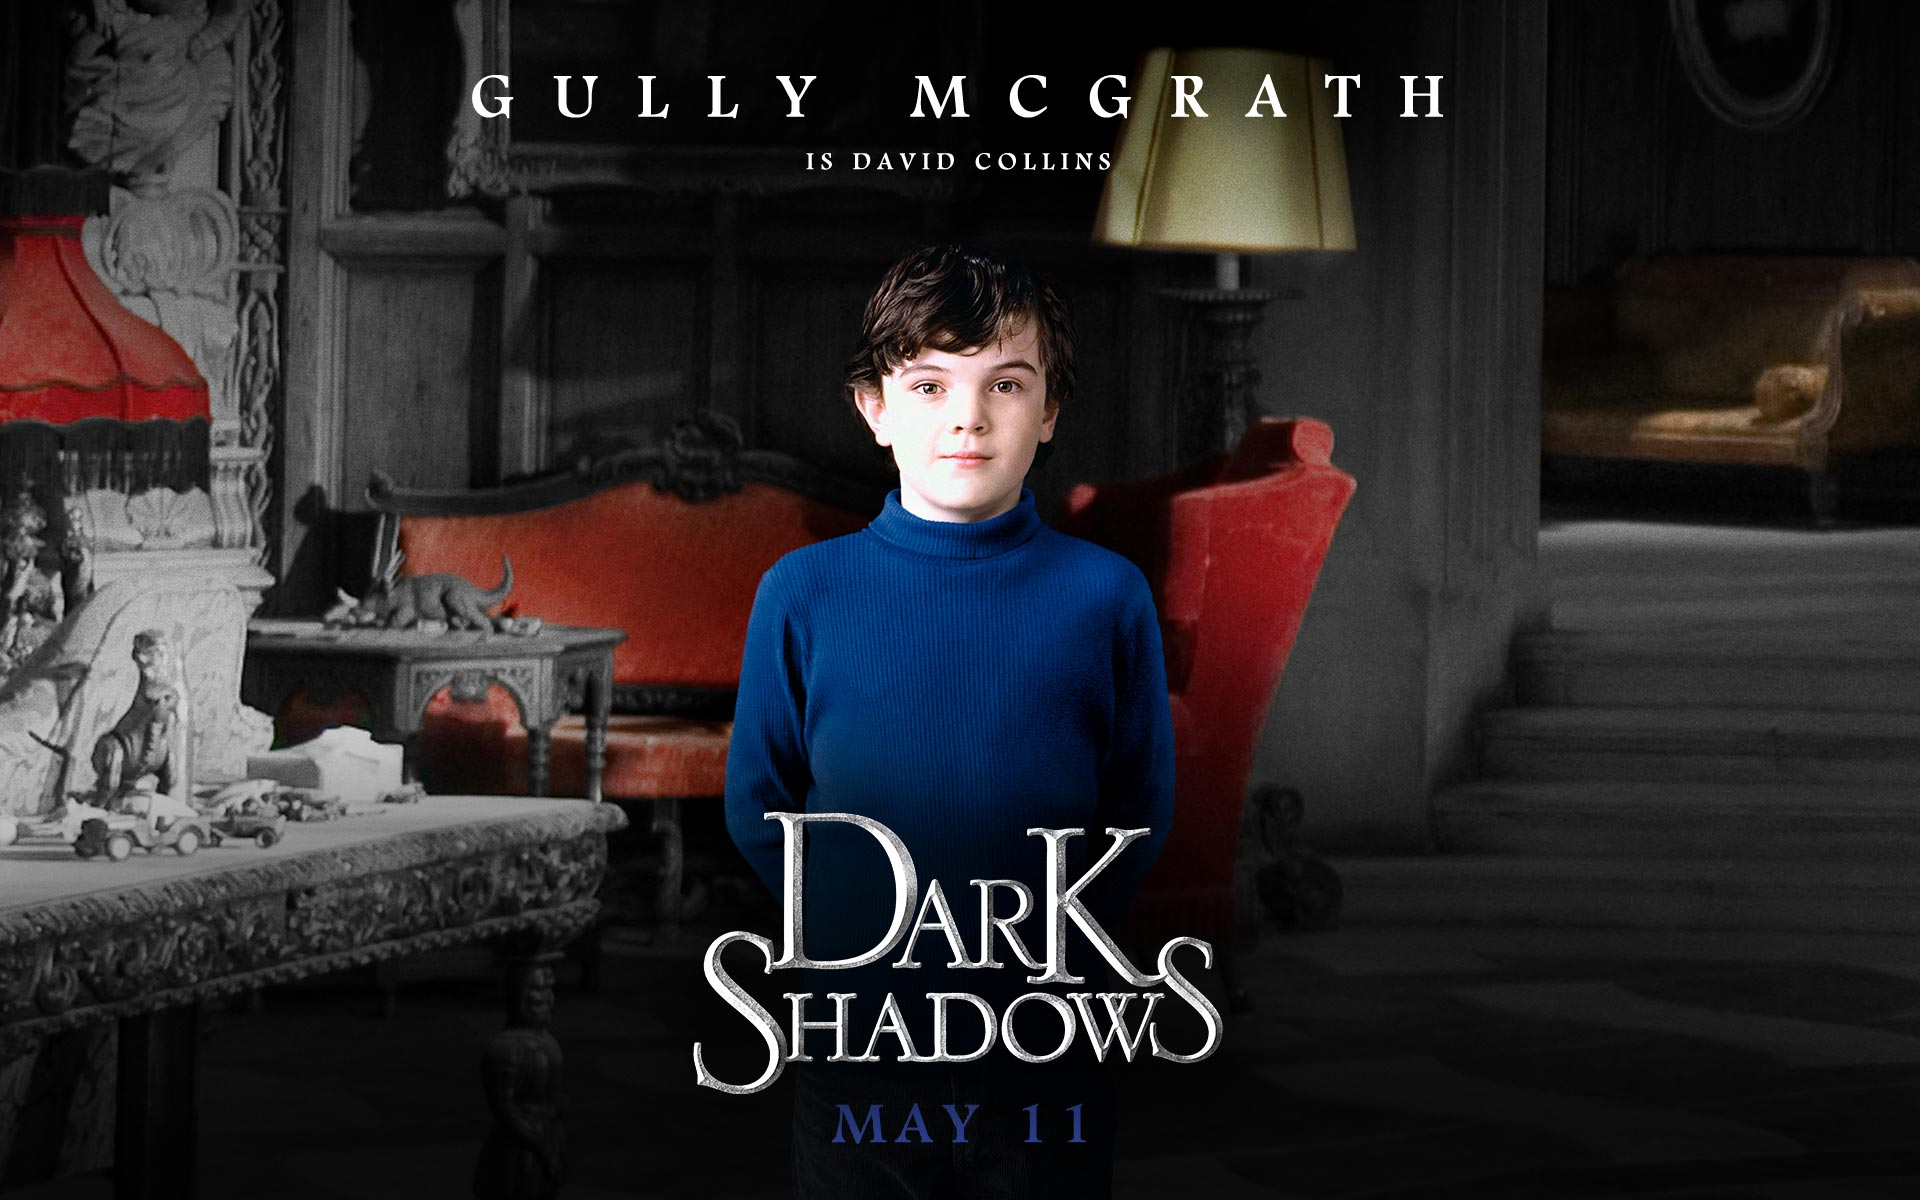 Dark Shadows wallpapers 19201200 Gully McGrath as David Collins 1920x1200